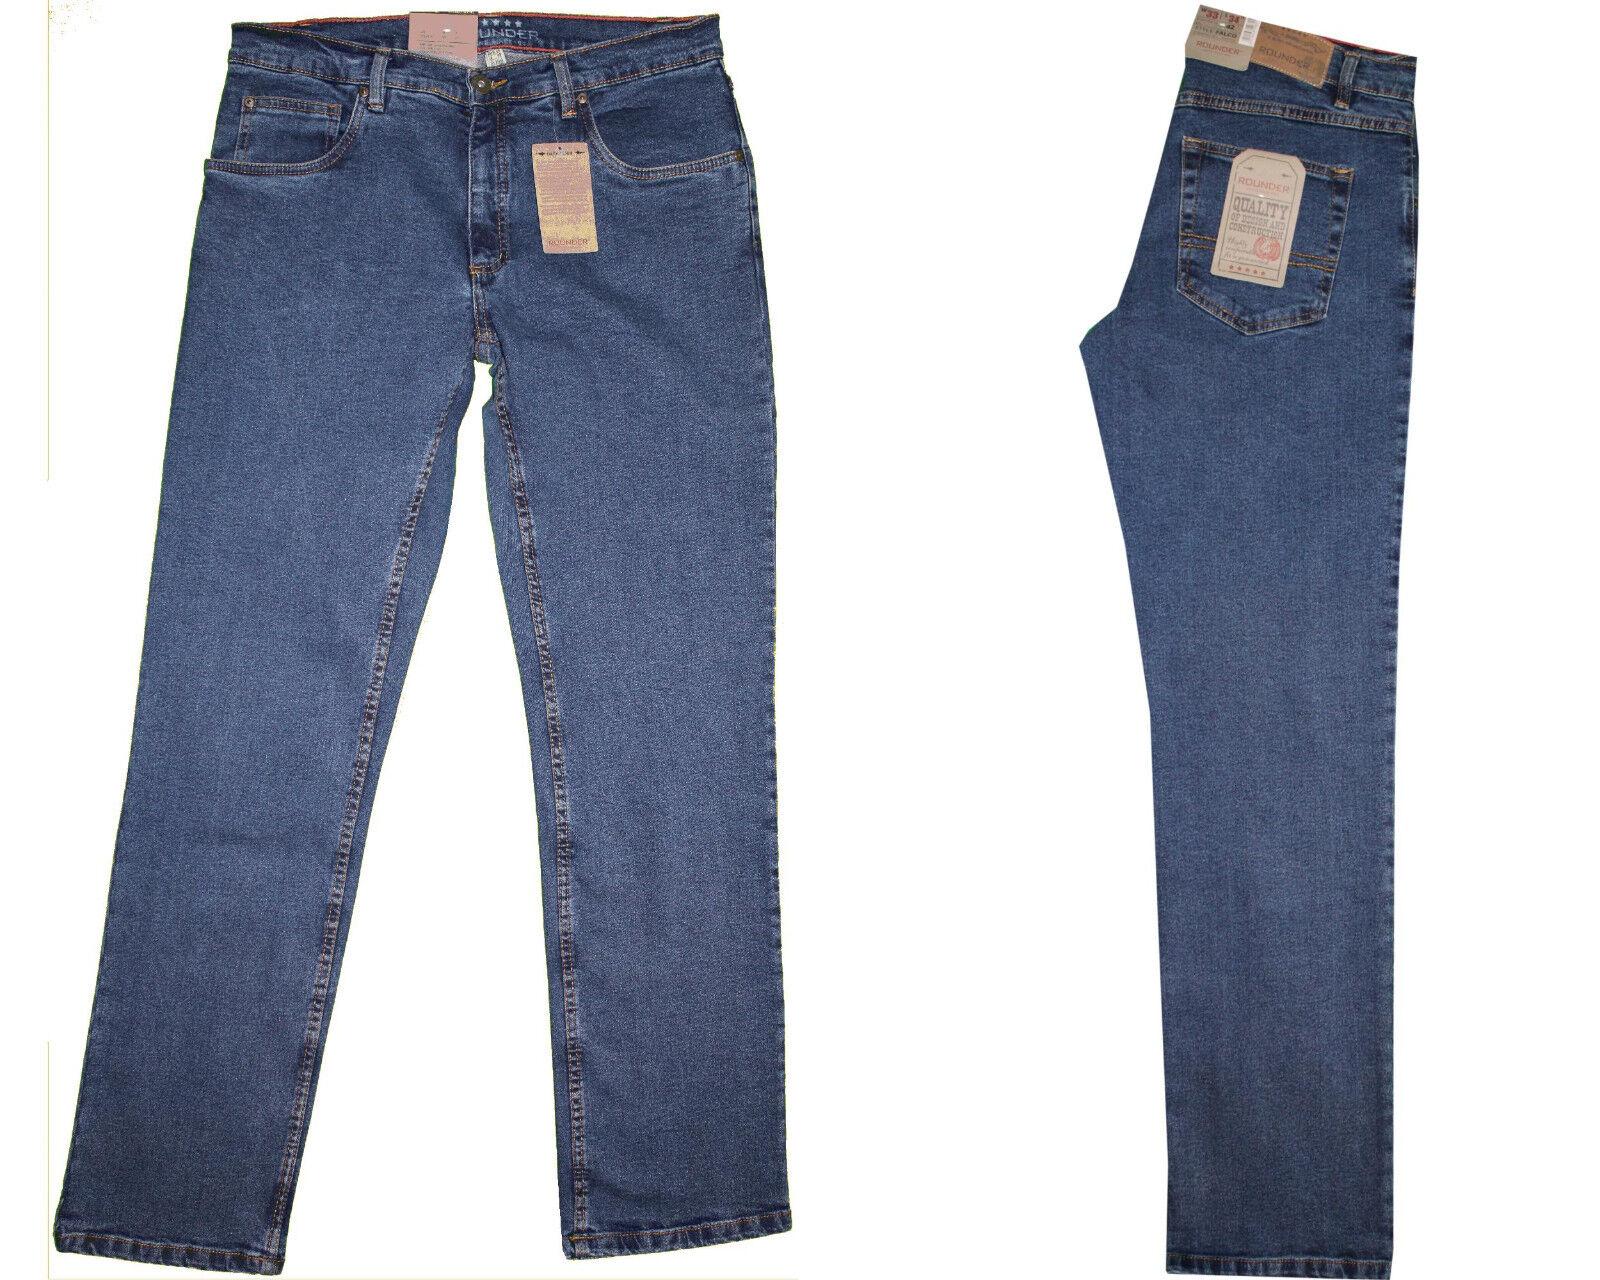 ✅ROUNDER by STOOKER Herren Stretch Jeans Hose TOPANGEBOT | eBay